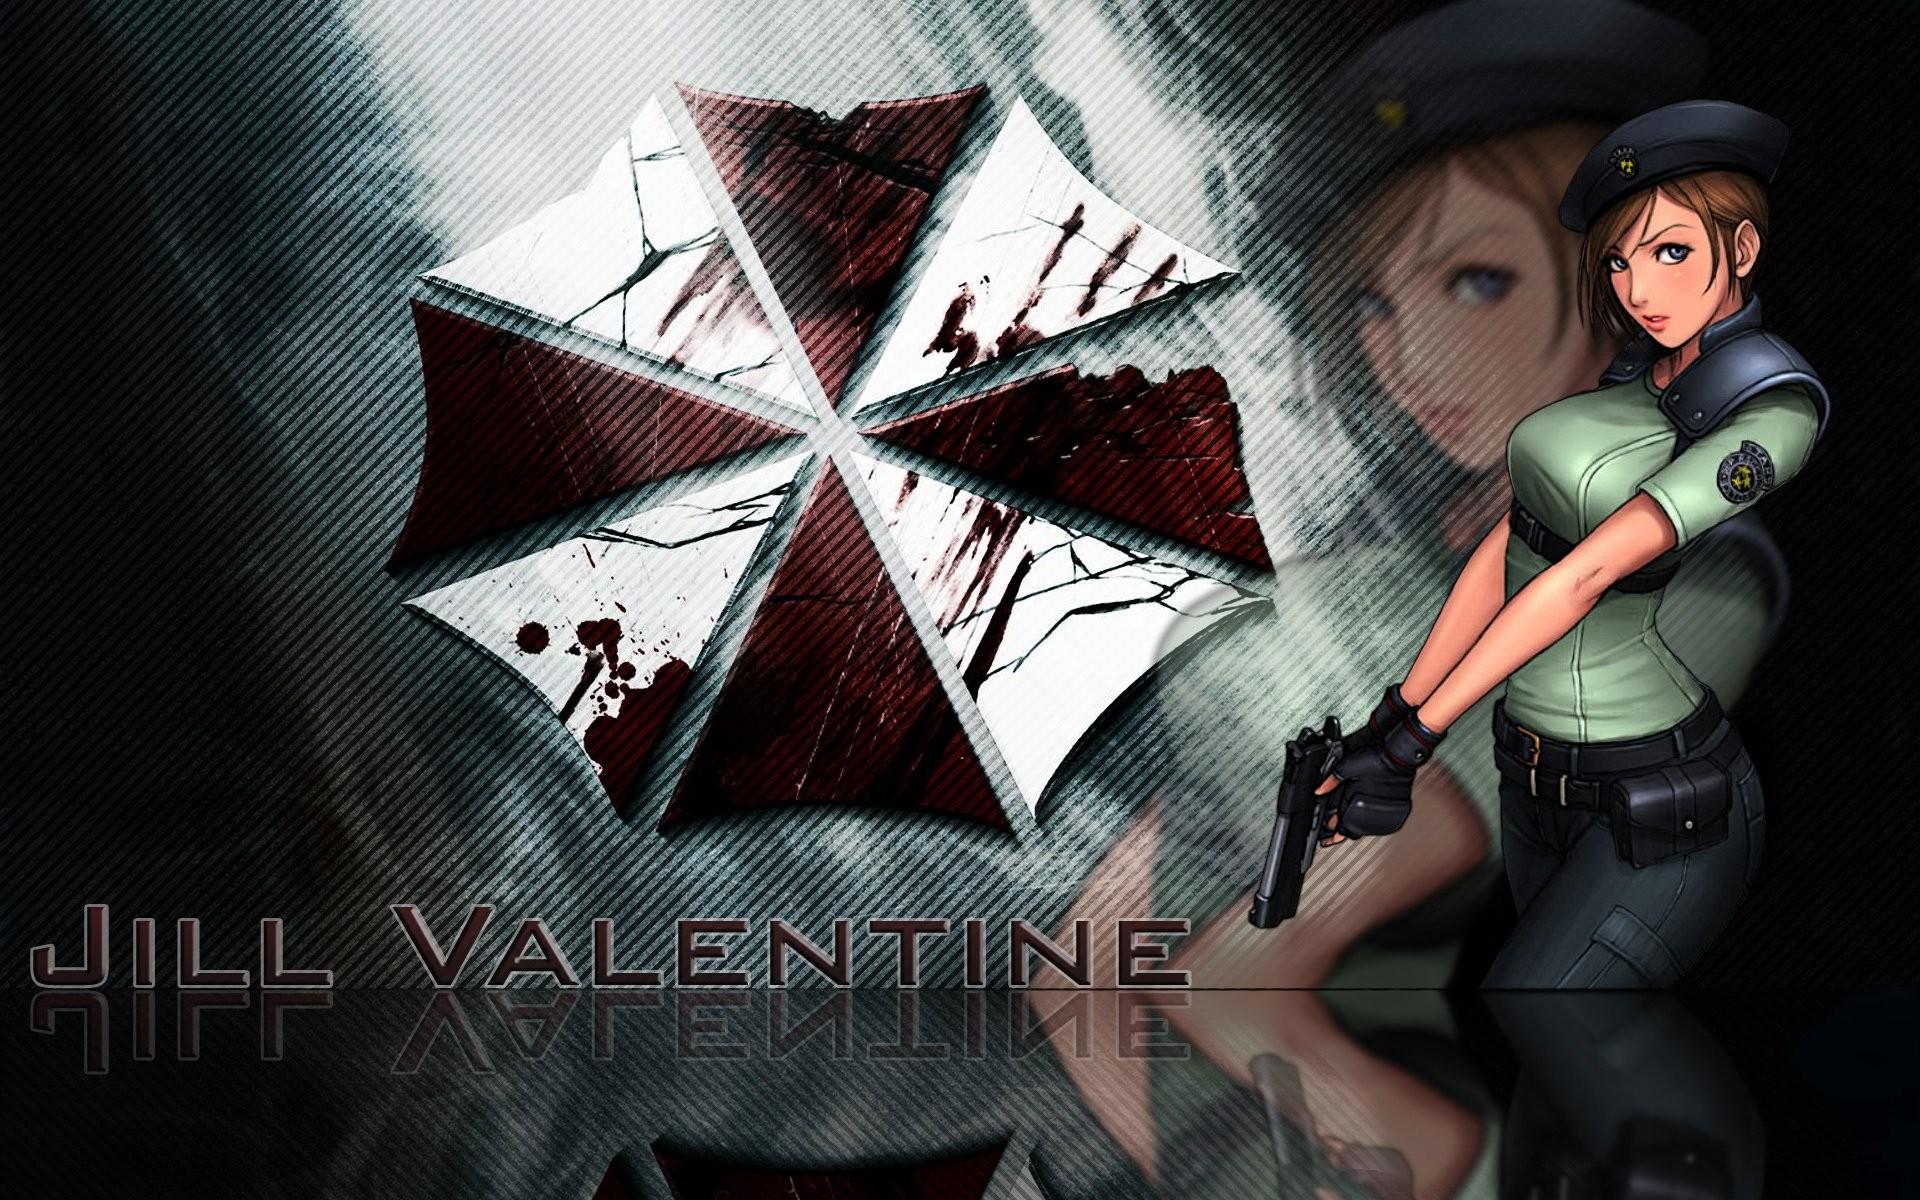 Jill Valentine Resident Evil 5 696256